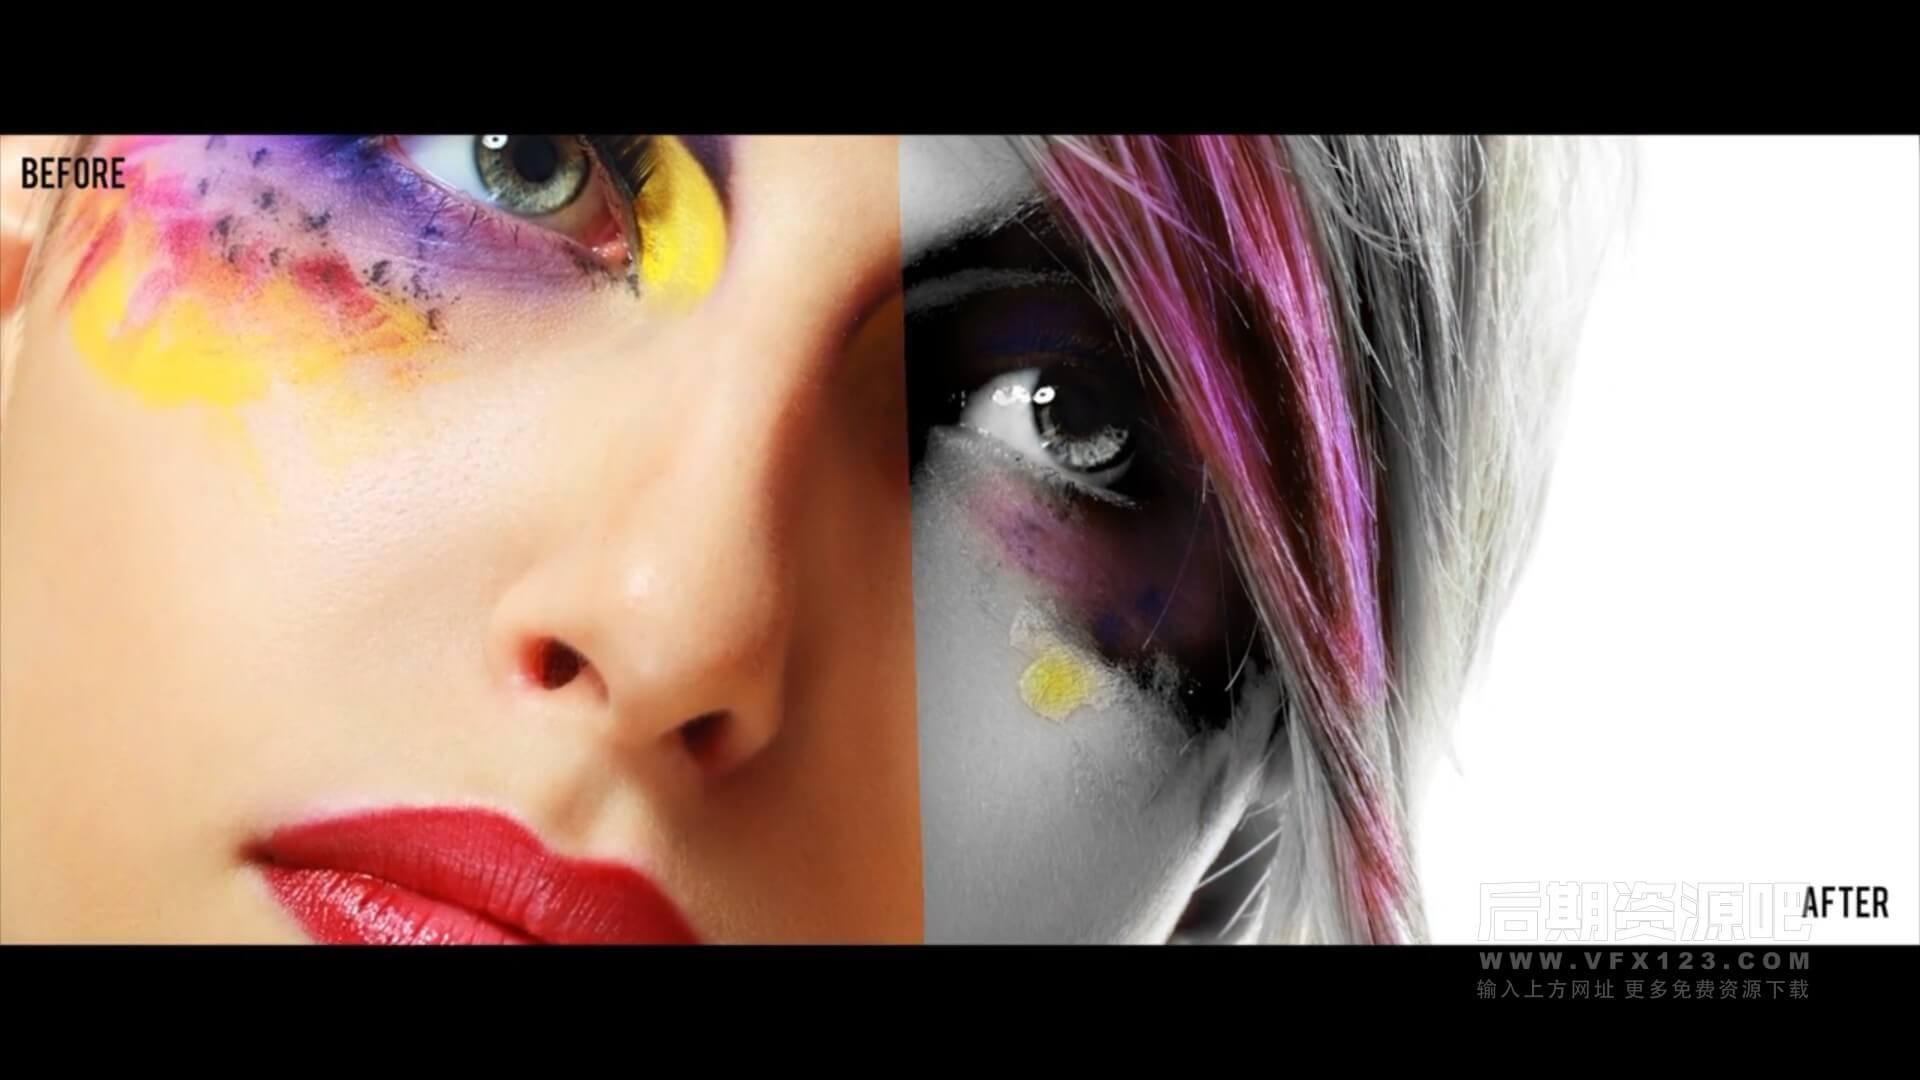 fcpx插件 影片画面局部换色颜色分级调色预设 支持fcpx 10.5.1 ProPalette